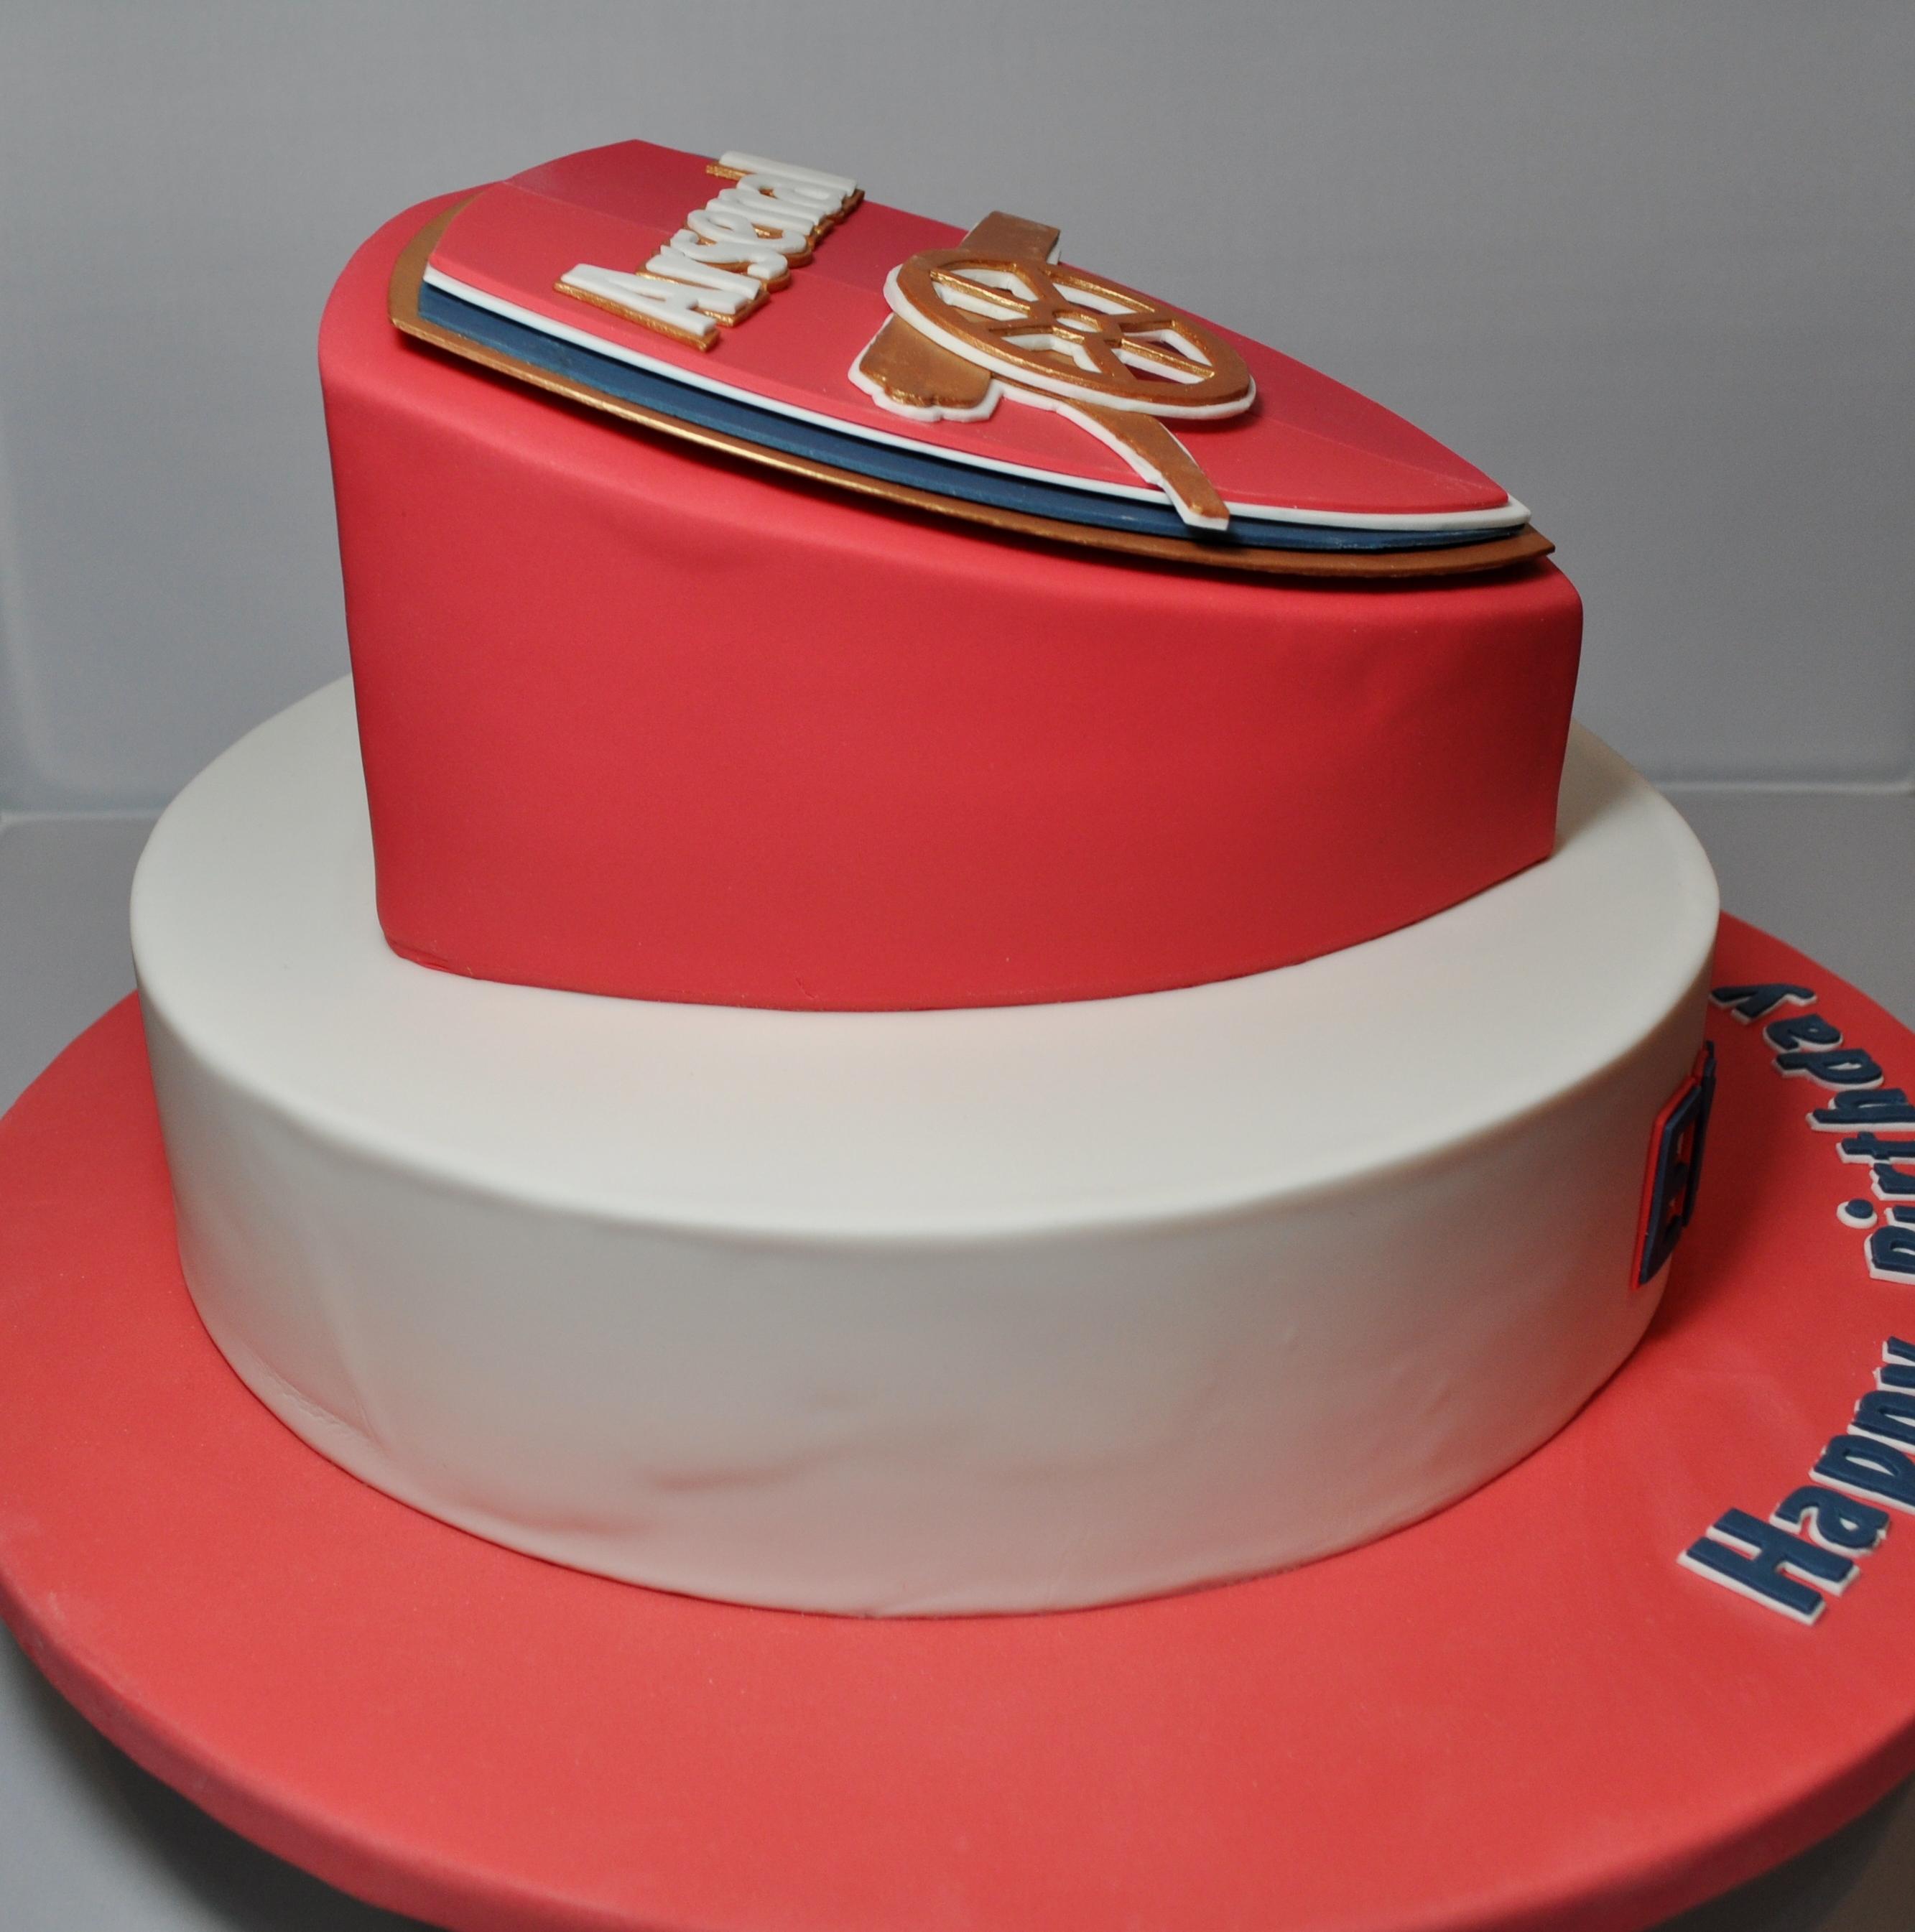 Arsenal Themed Birthday Cake - CakeCentral.com